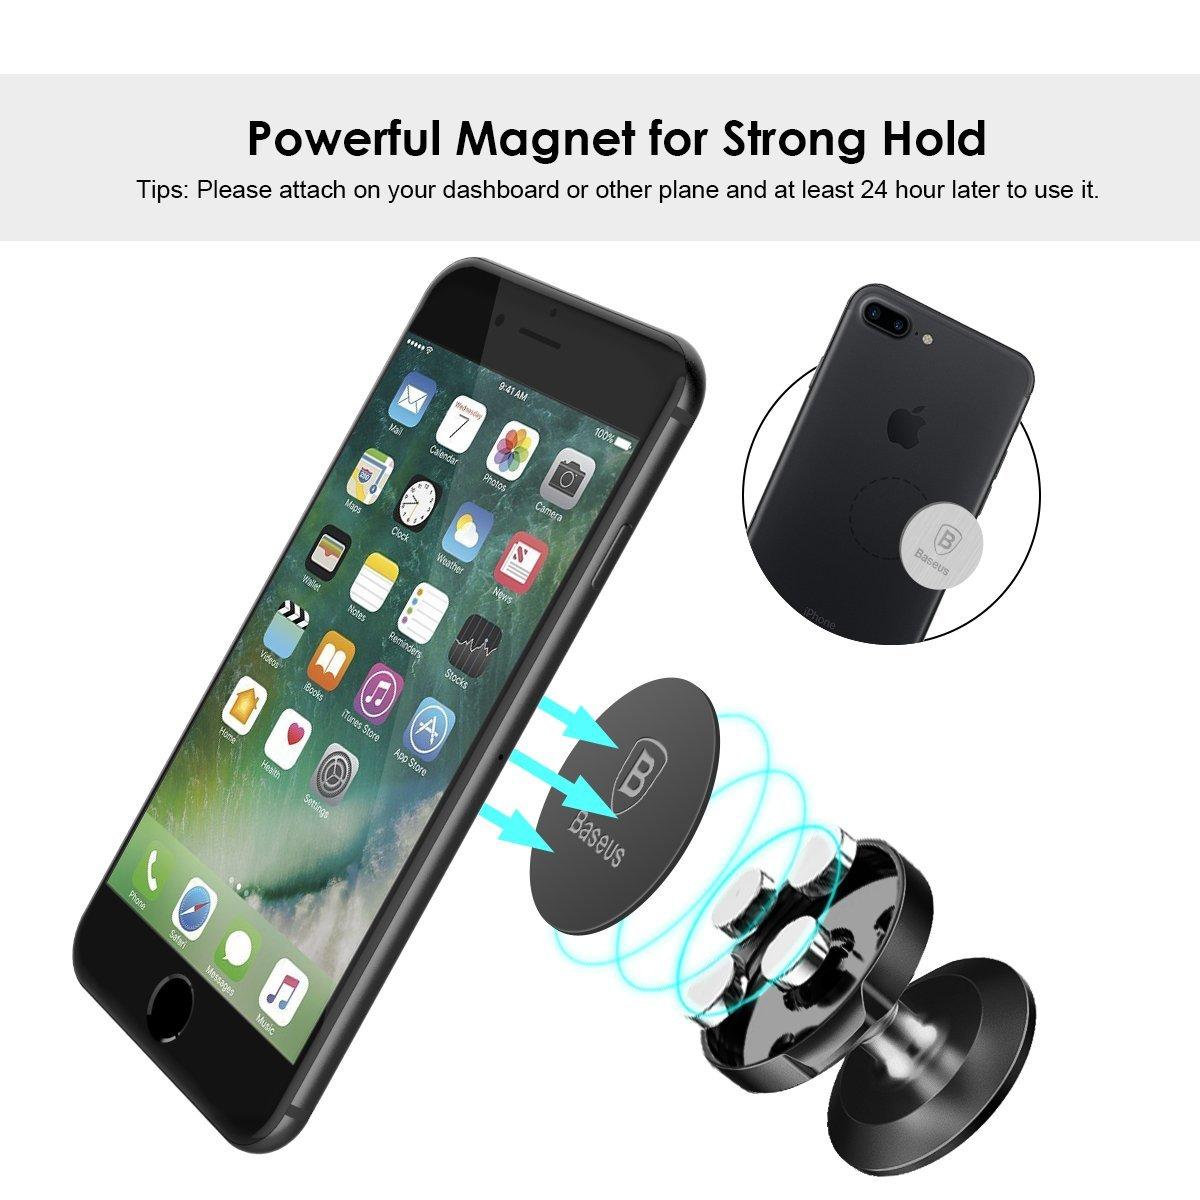 Baseus Universal Magnetic Car Mount Phone Holder $7.49